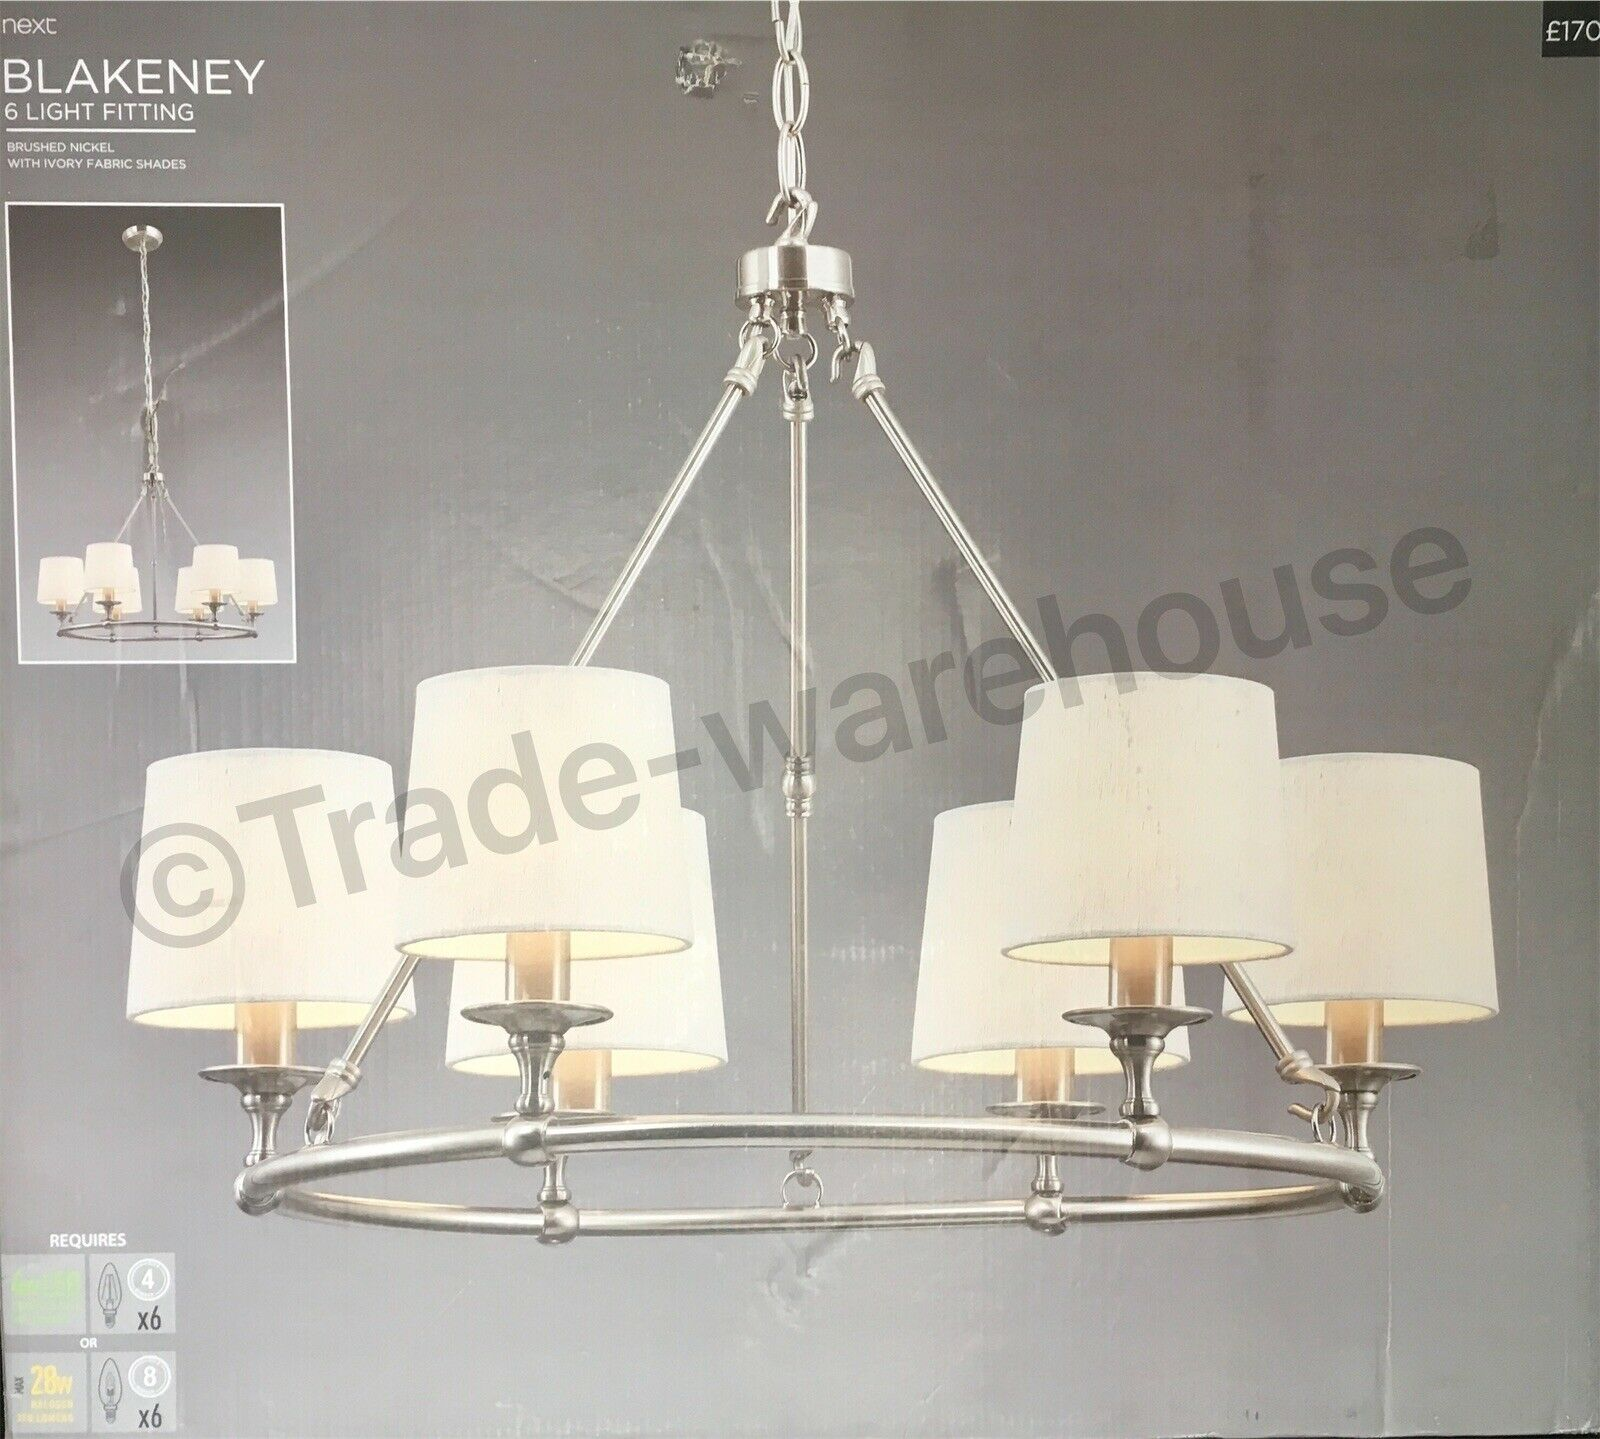 Next Blakeney 6 Light Fitting Brand New In Sealed Box r1